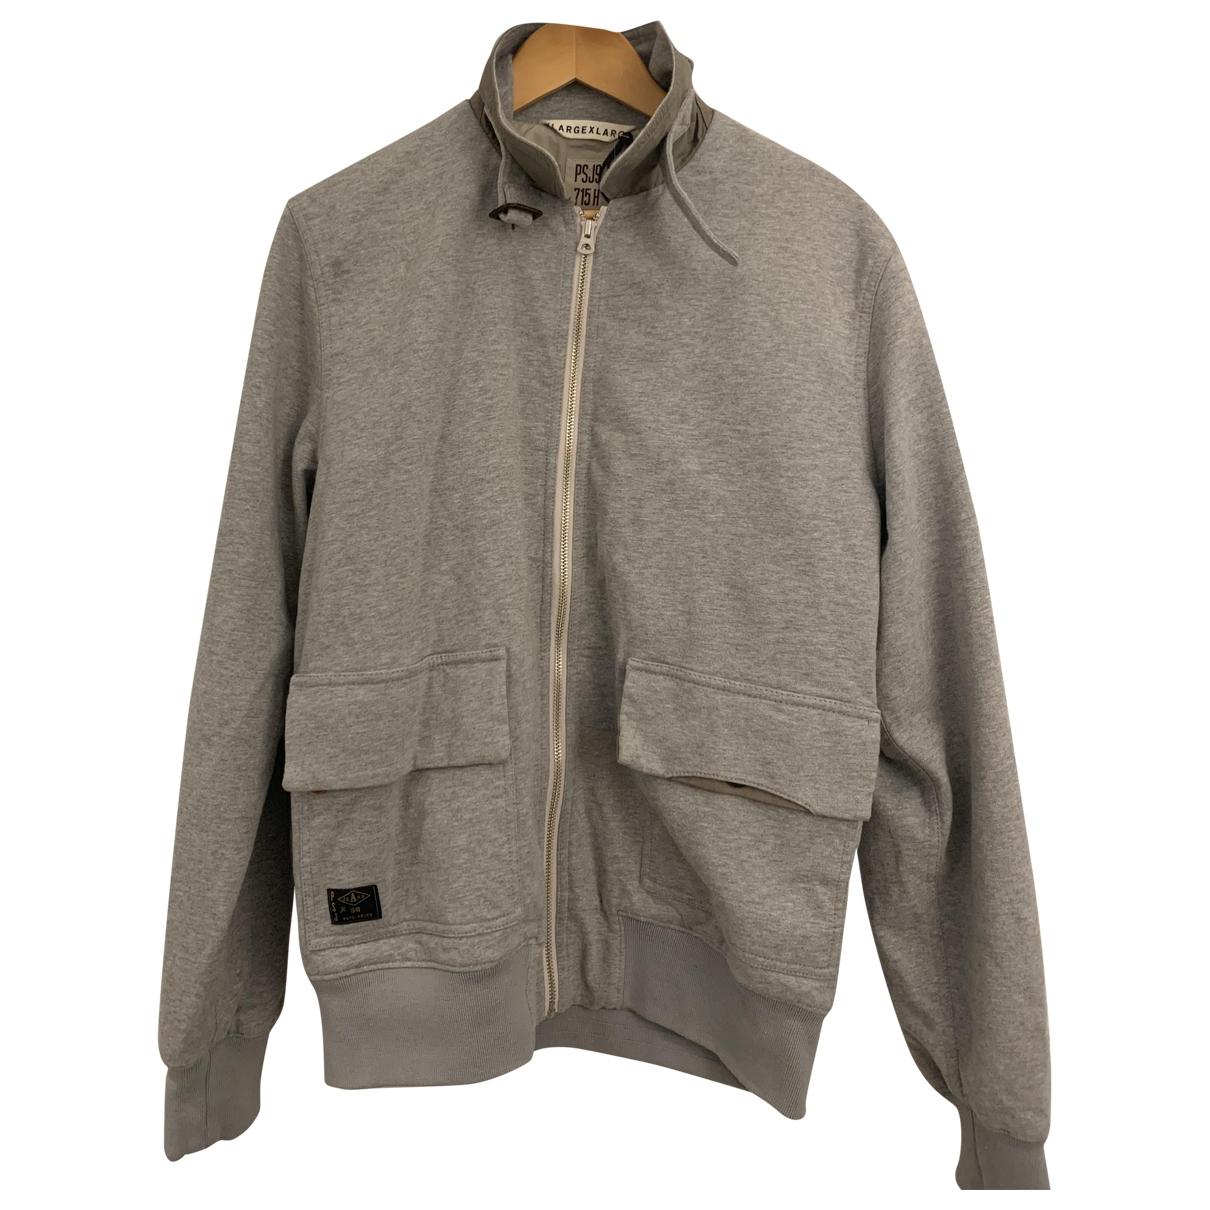 Paul Smith \N Grey Cotton jacket  for Men XL International